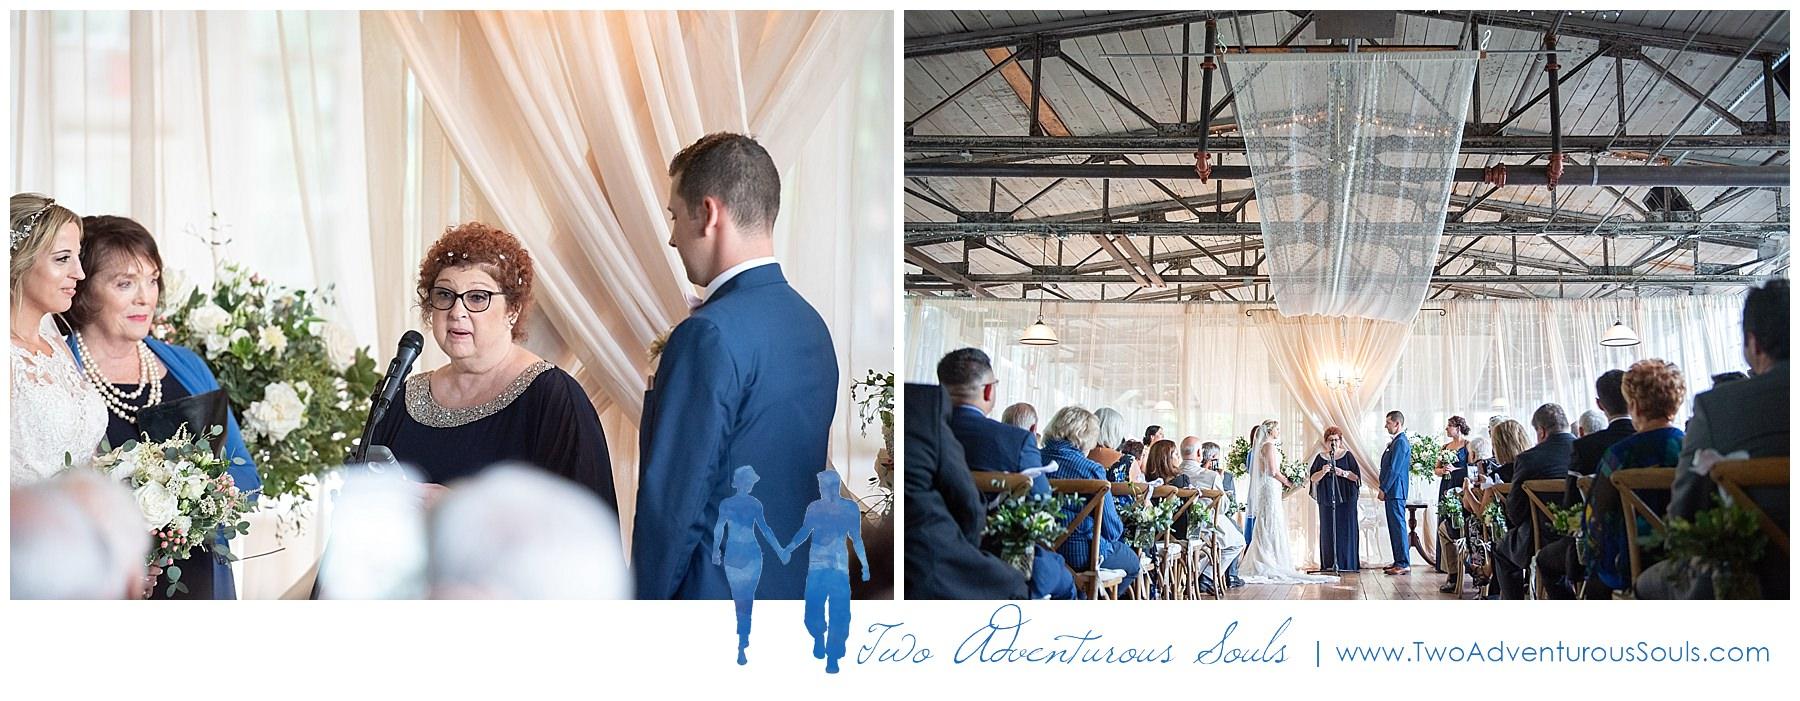 Connecticut Wedding Photographers, Lace Factory Wedding Photographers, Two Adventurous Souls - 083119_0036.jpg